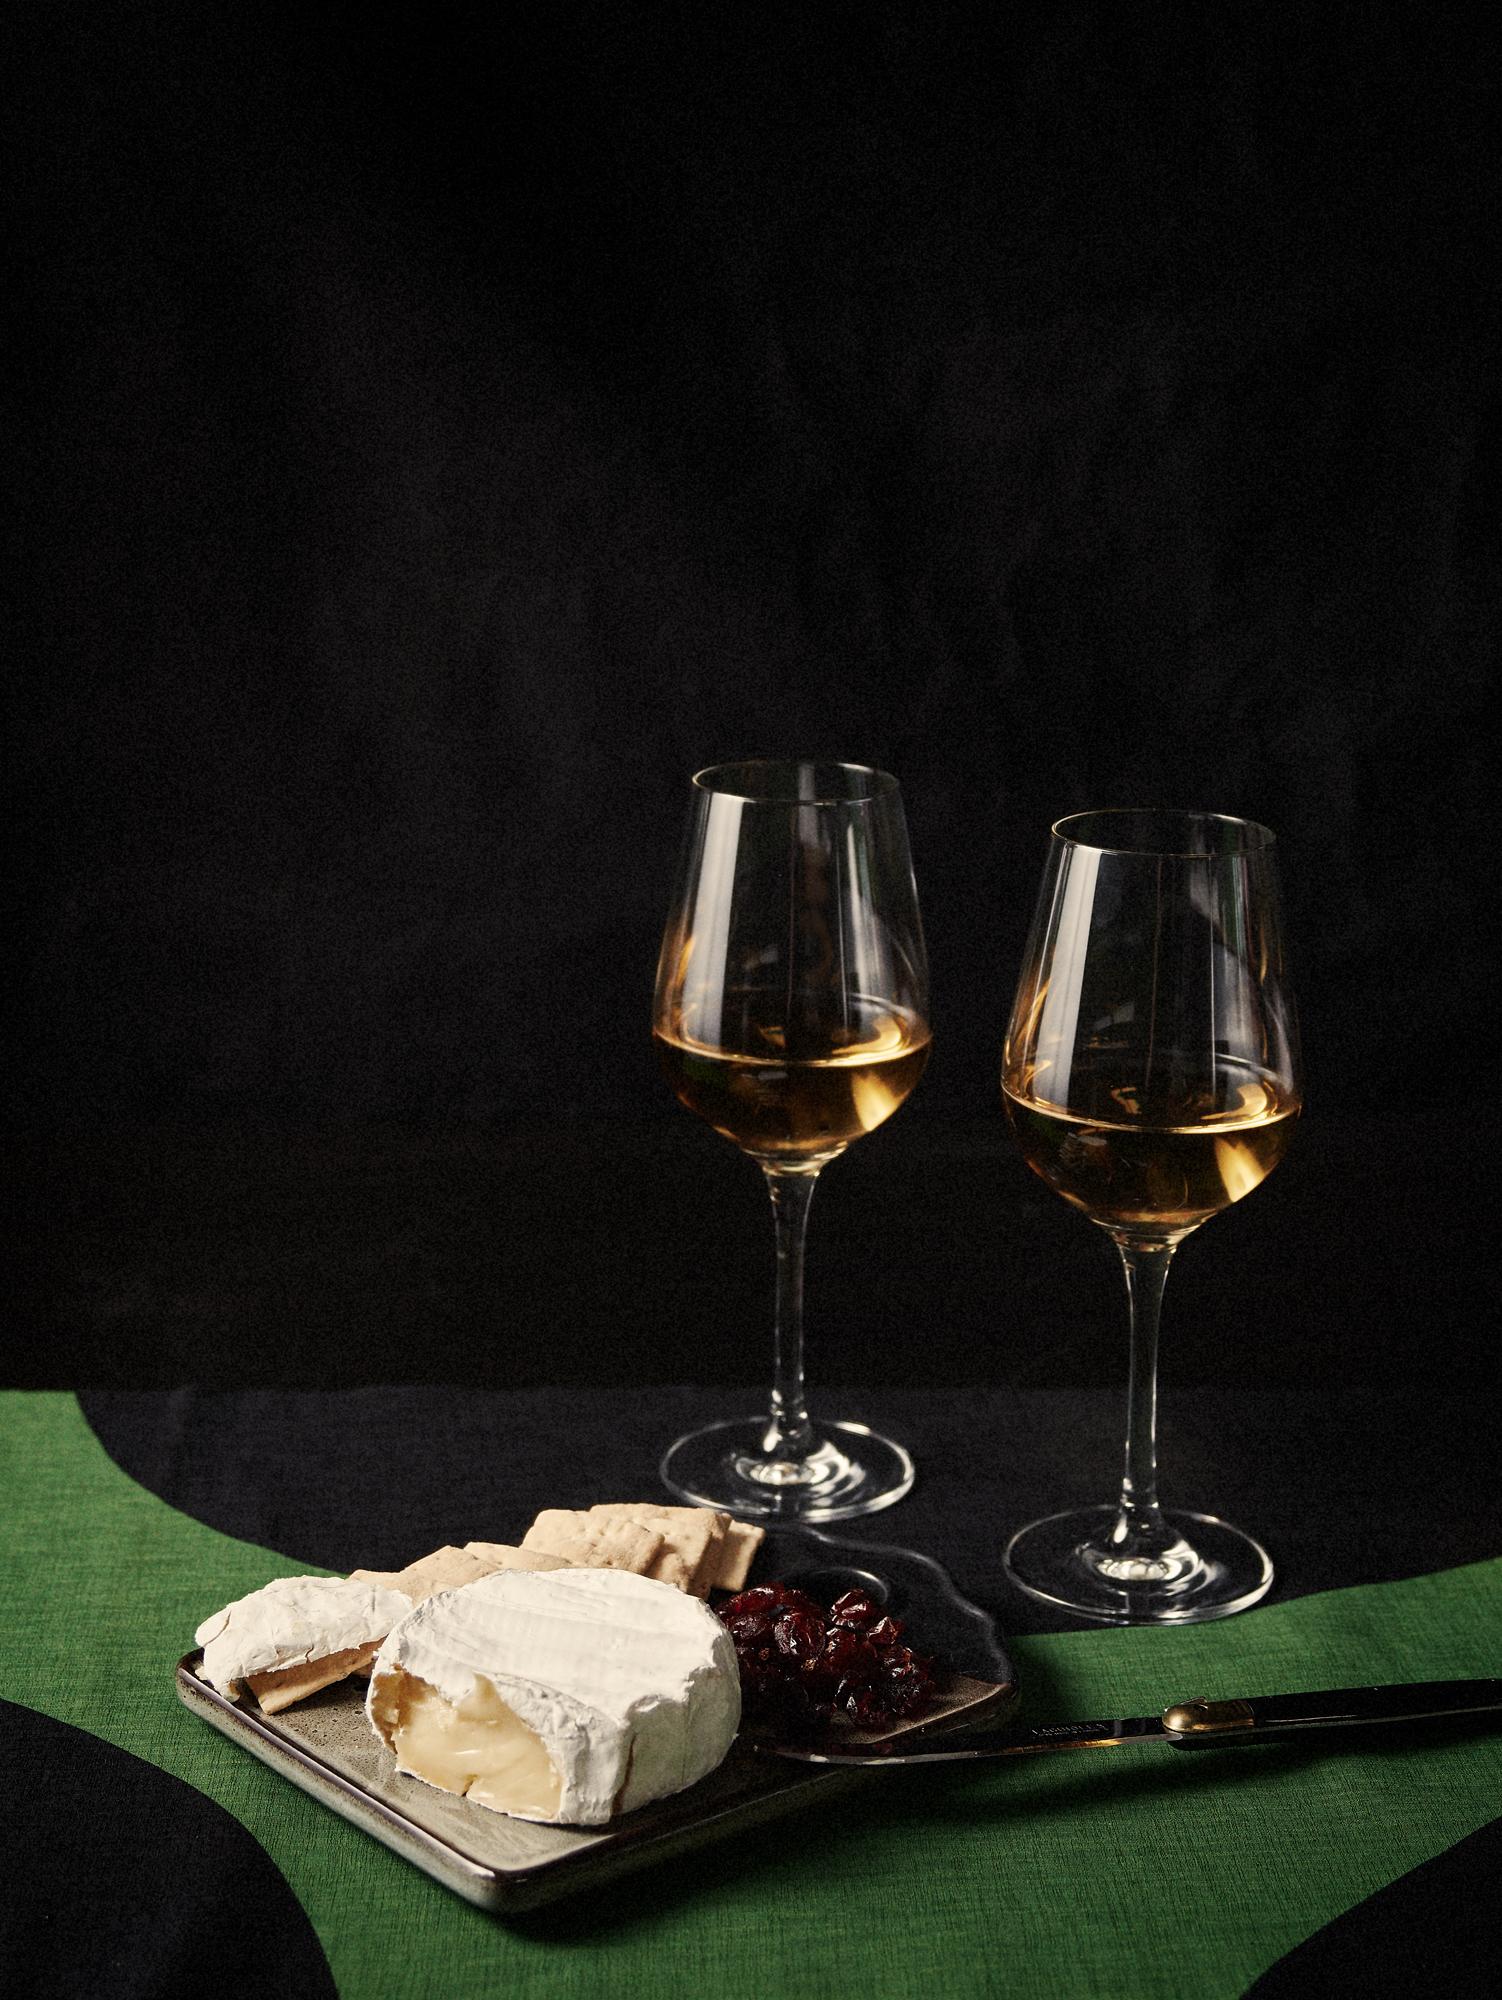 wine + brie